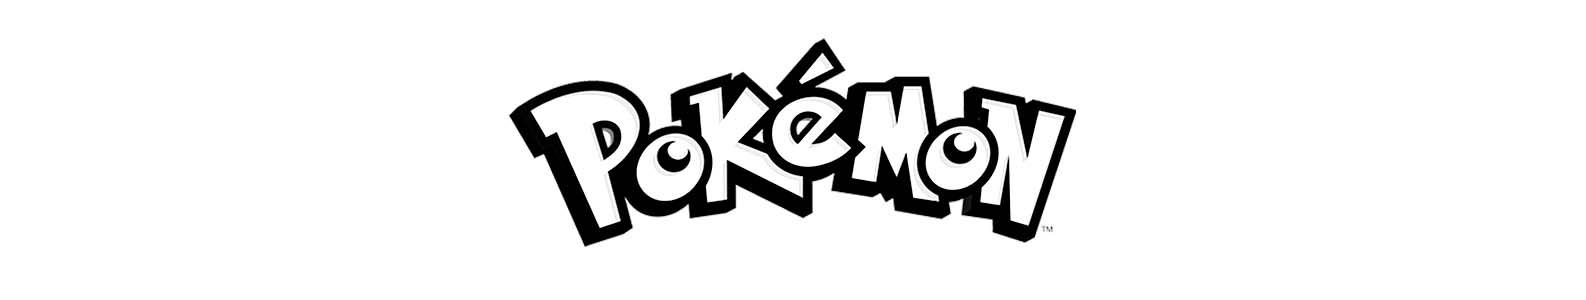 Pokemon brand header image